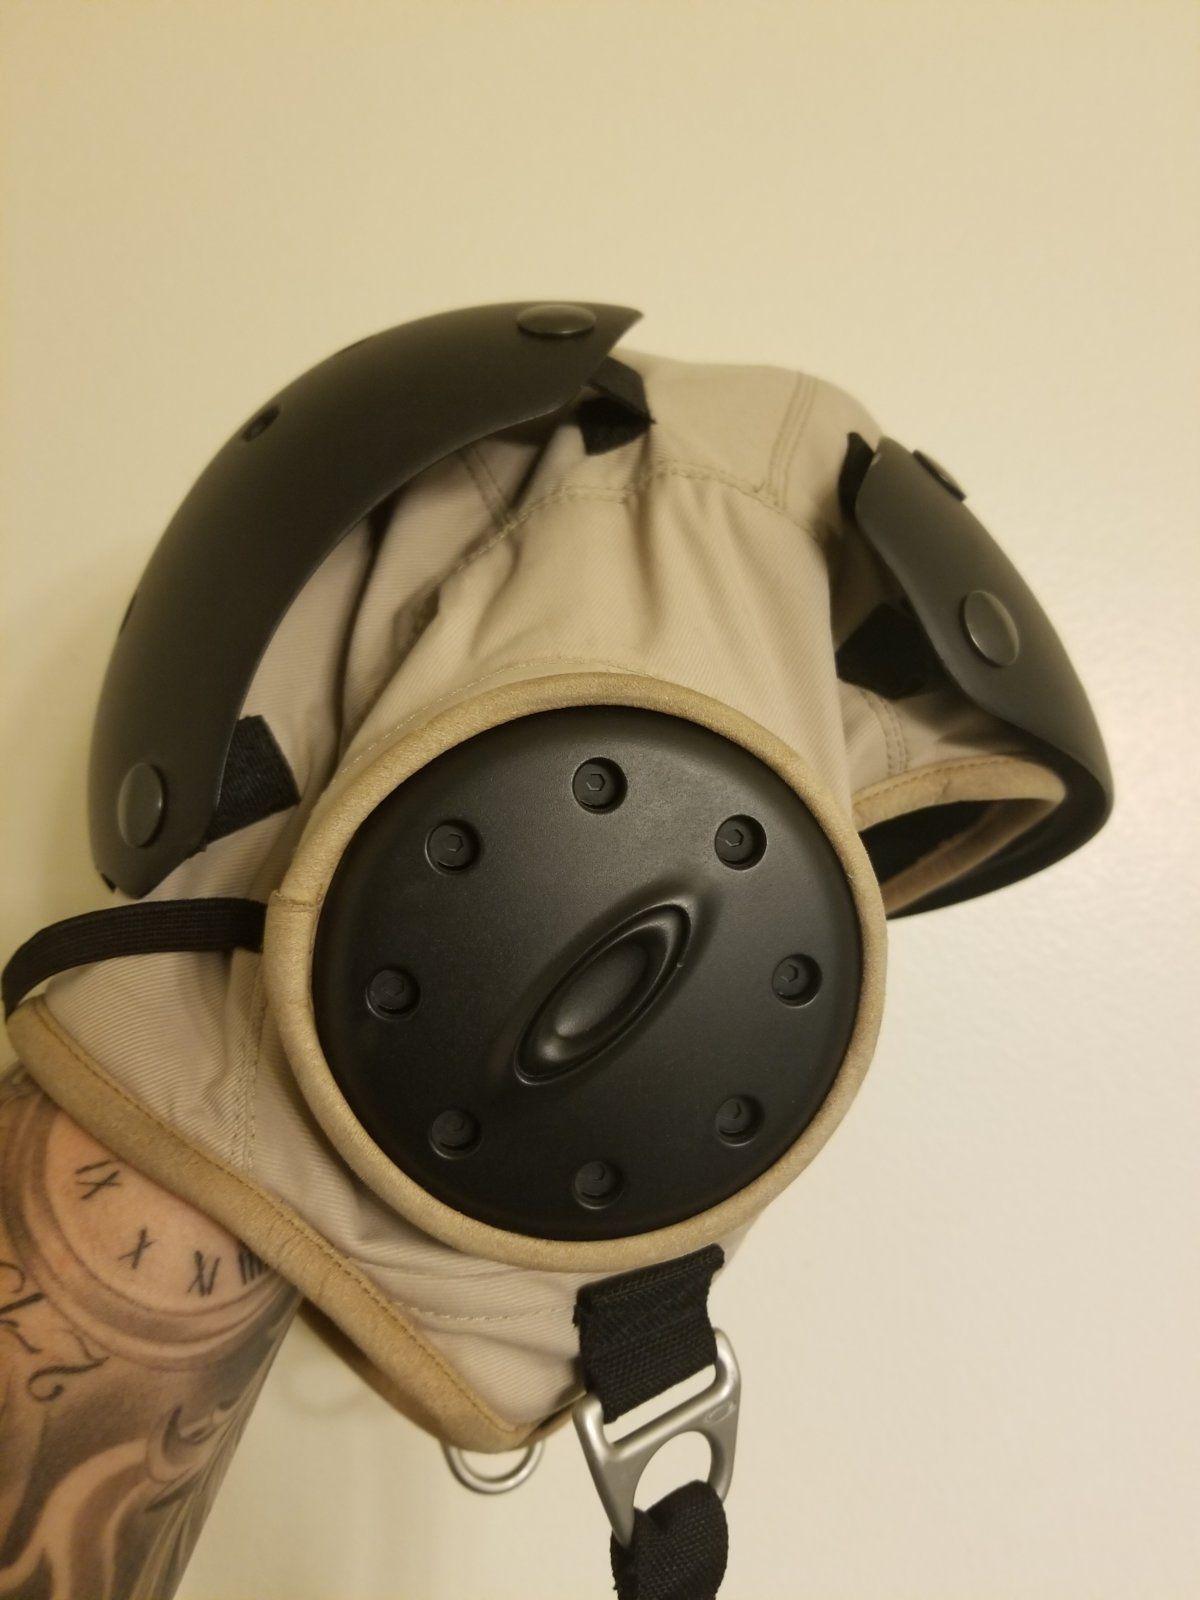 oakley flight deck and helmet